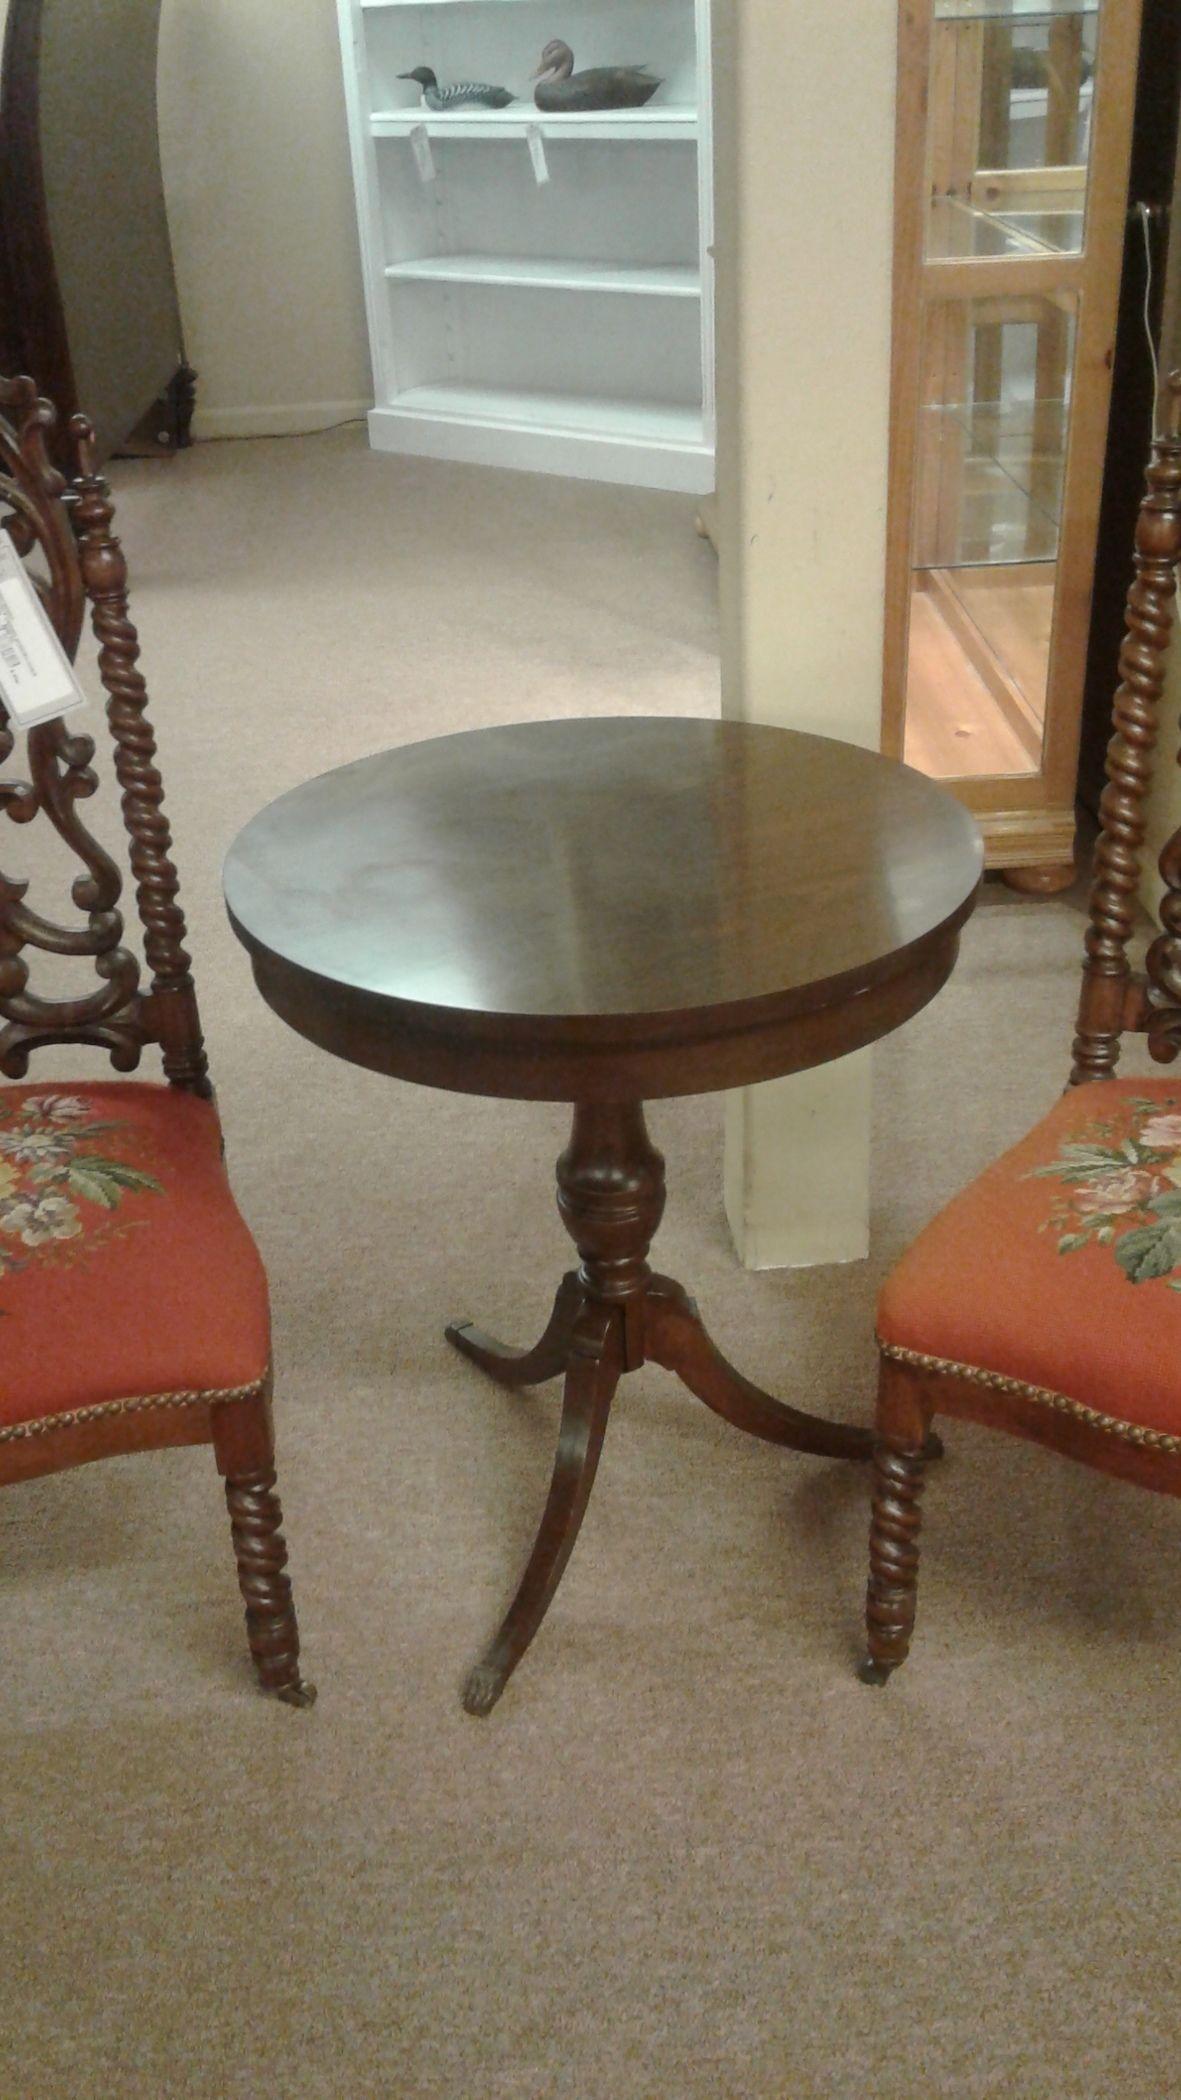 Duncan Phyfe Round Table Delmarva Furniture Consignment